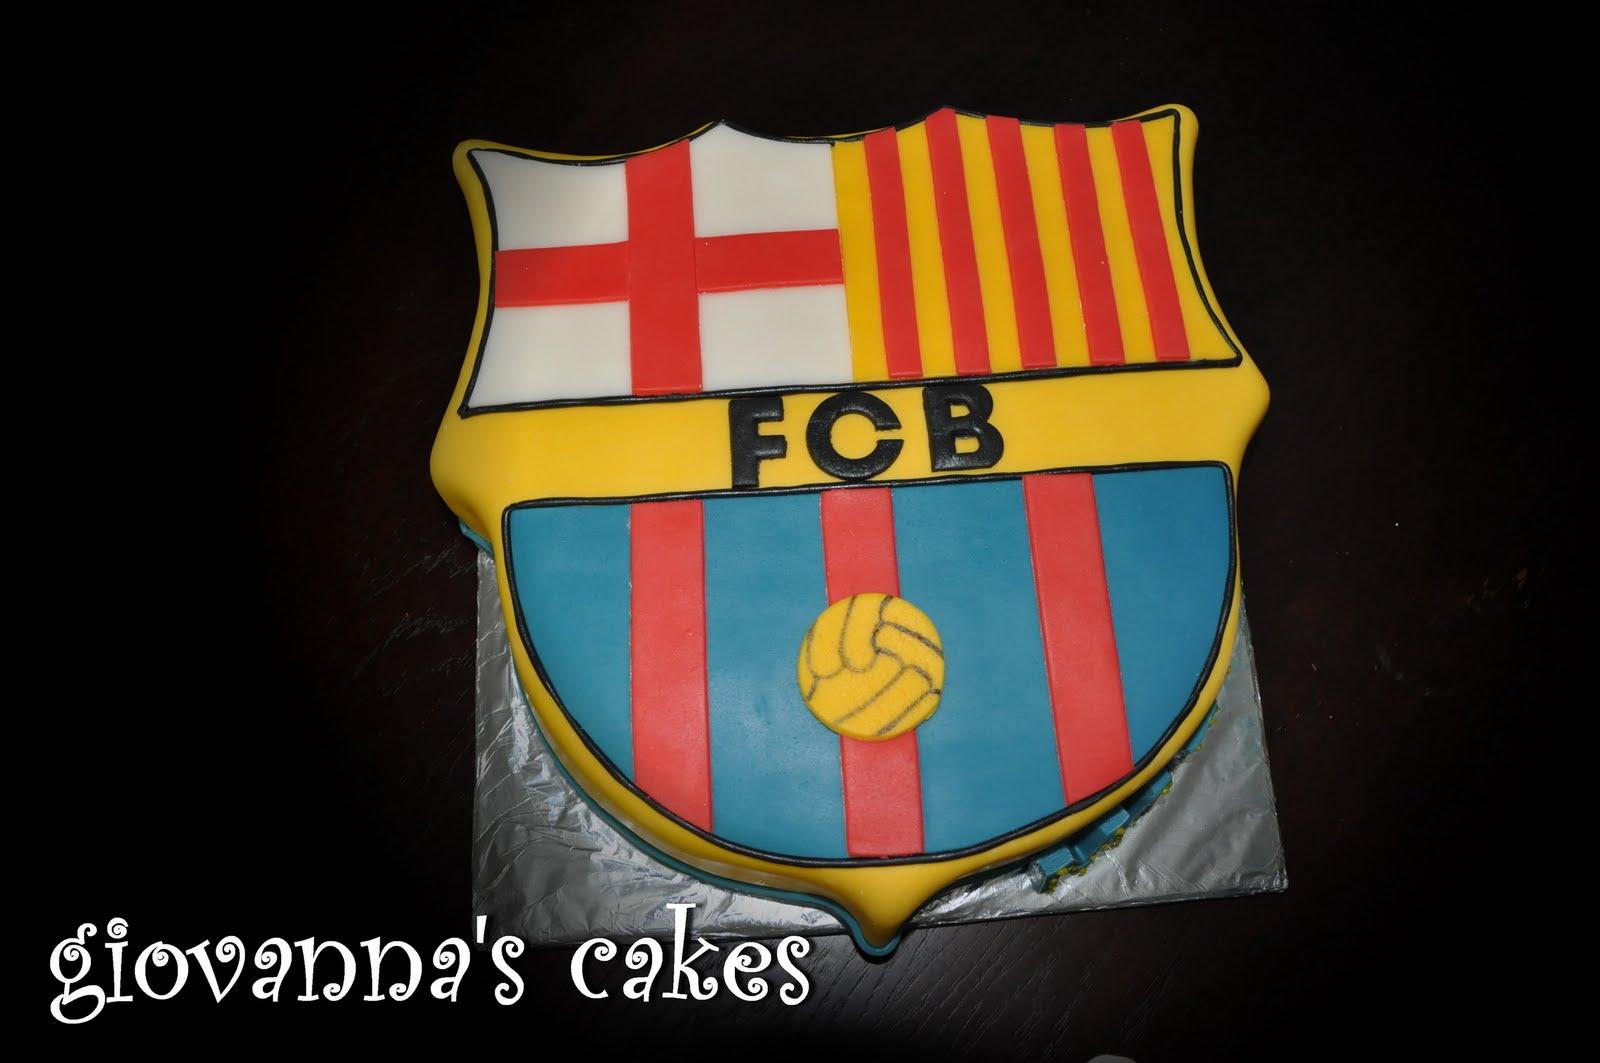 Giovannas cakes fc barcelona crest fc barcelona crest biocorpaavc